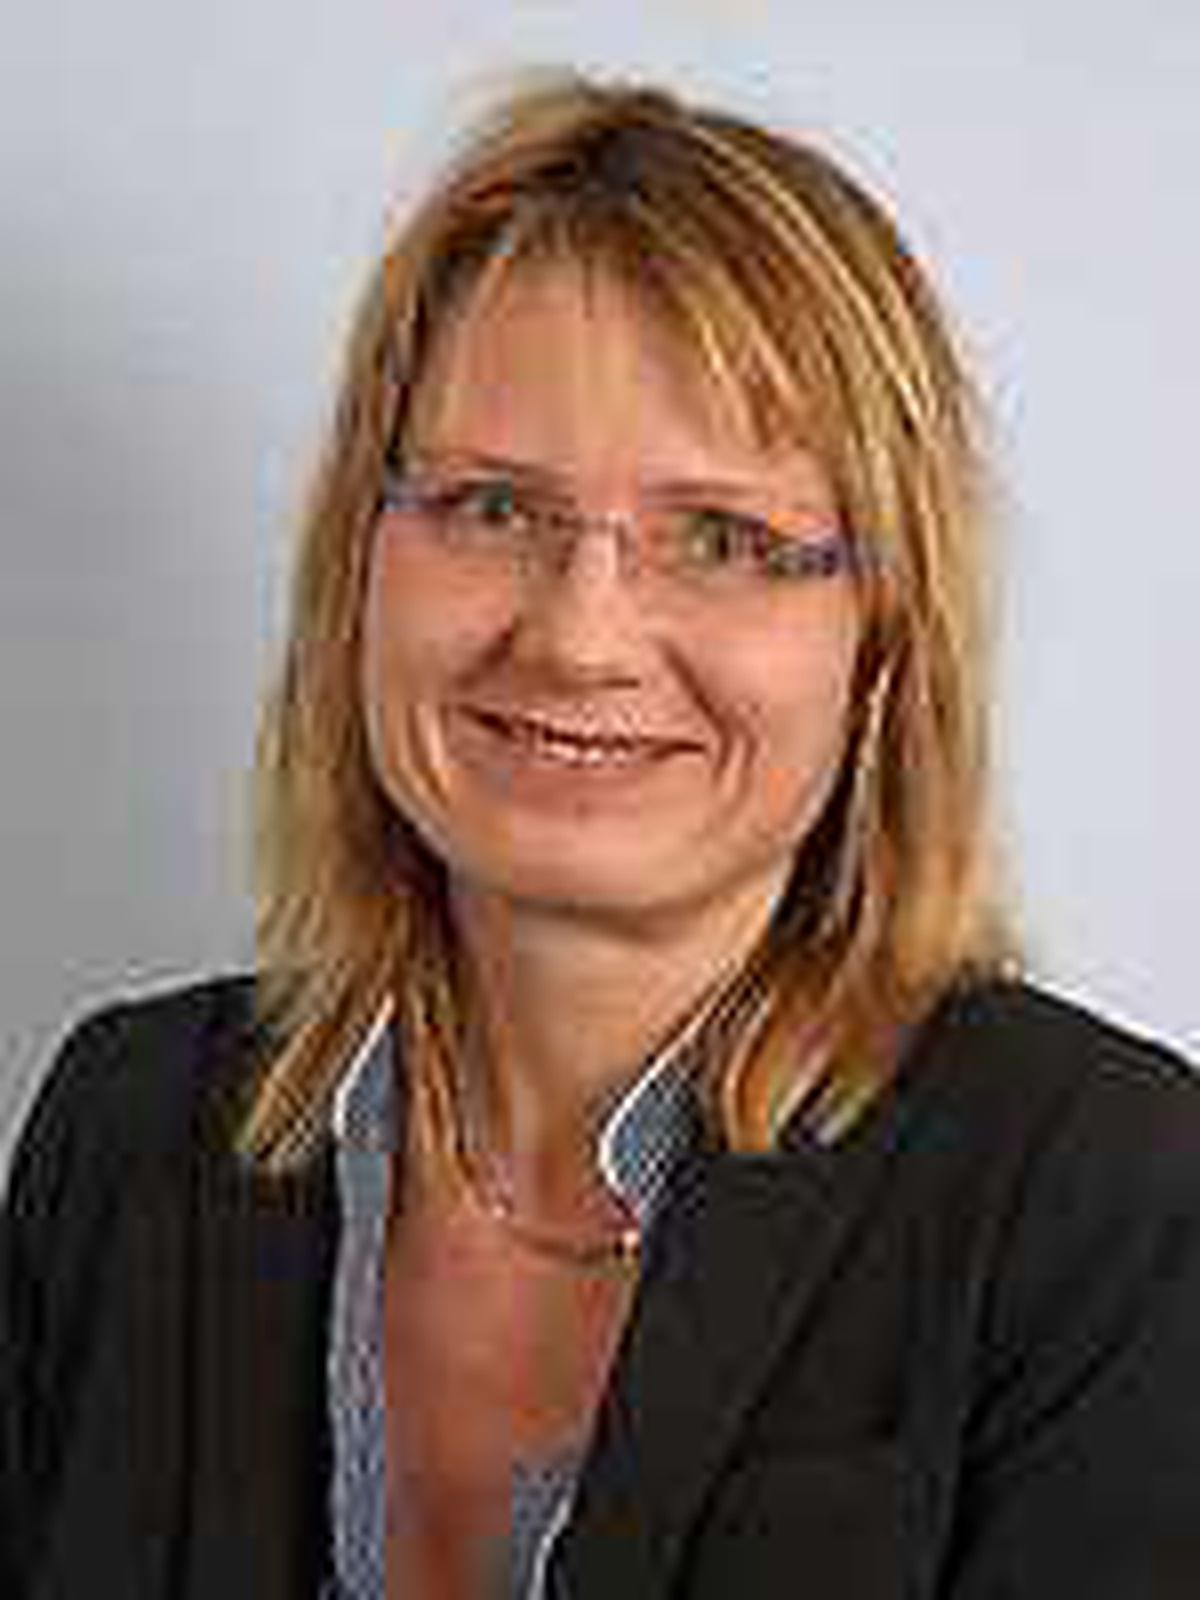 Dr Margaret King still works at New Cross